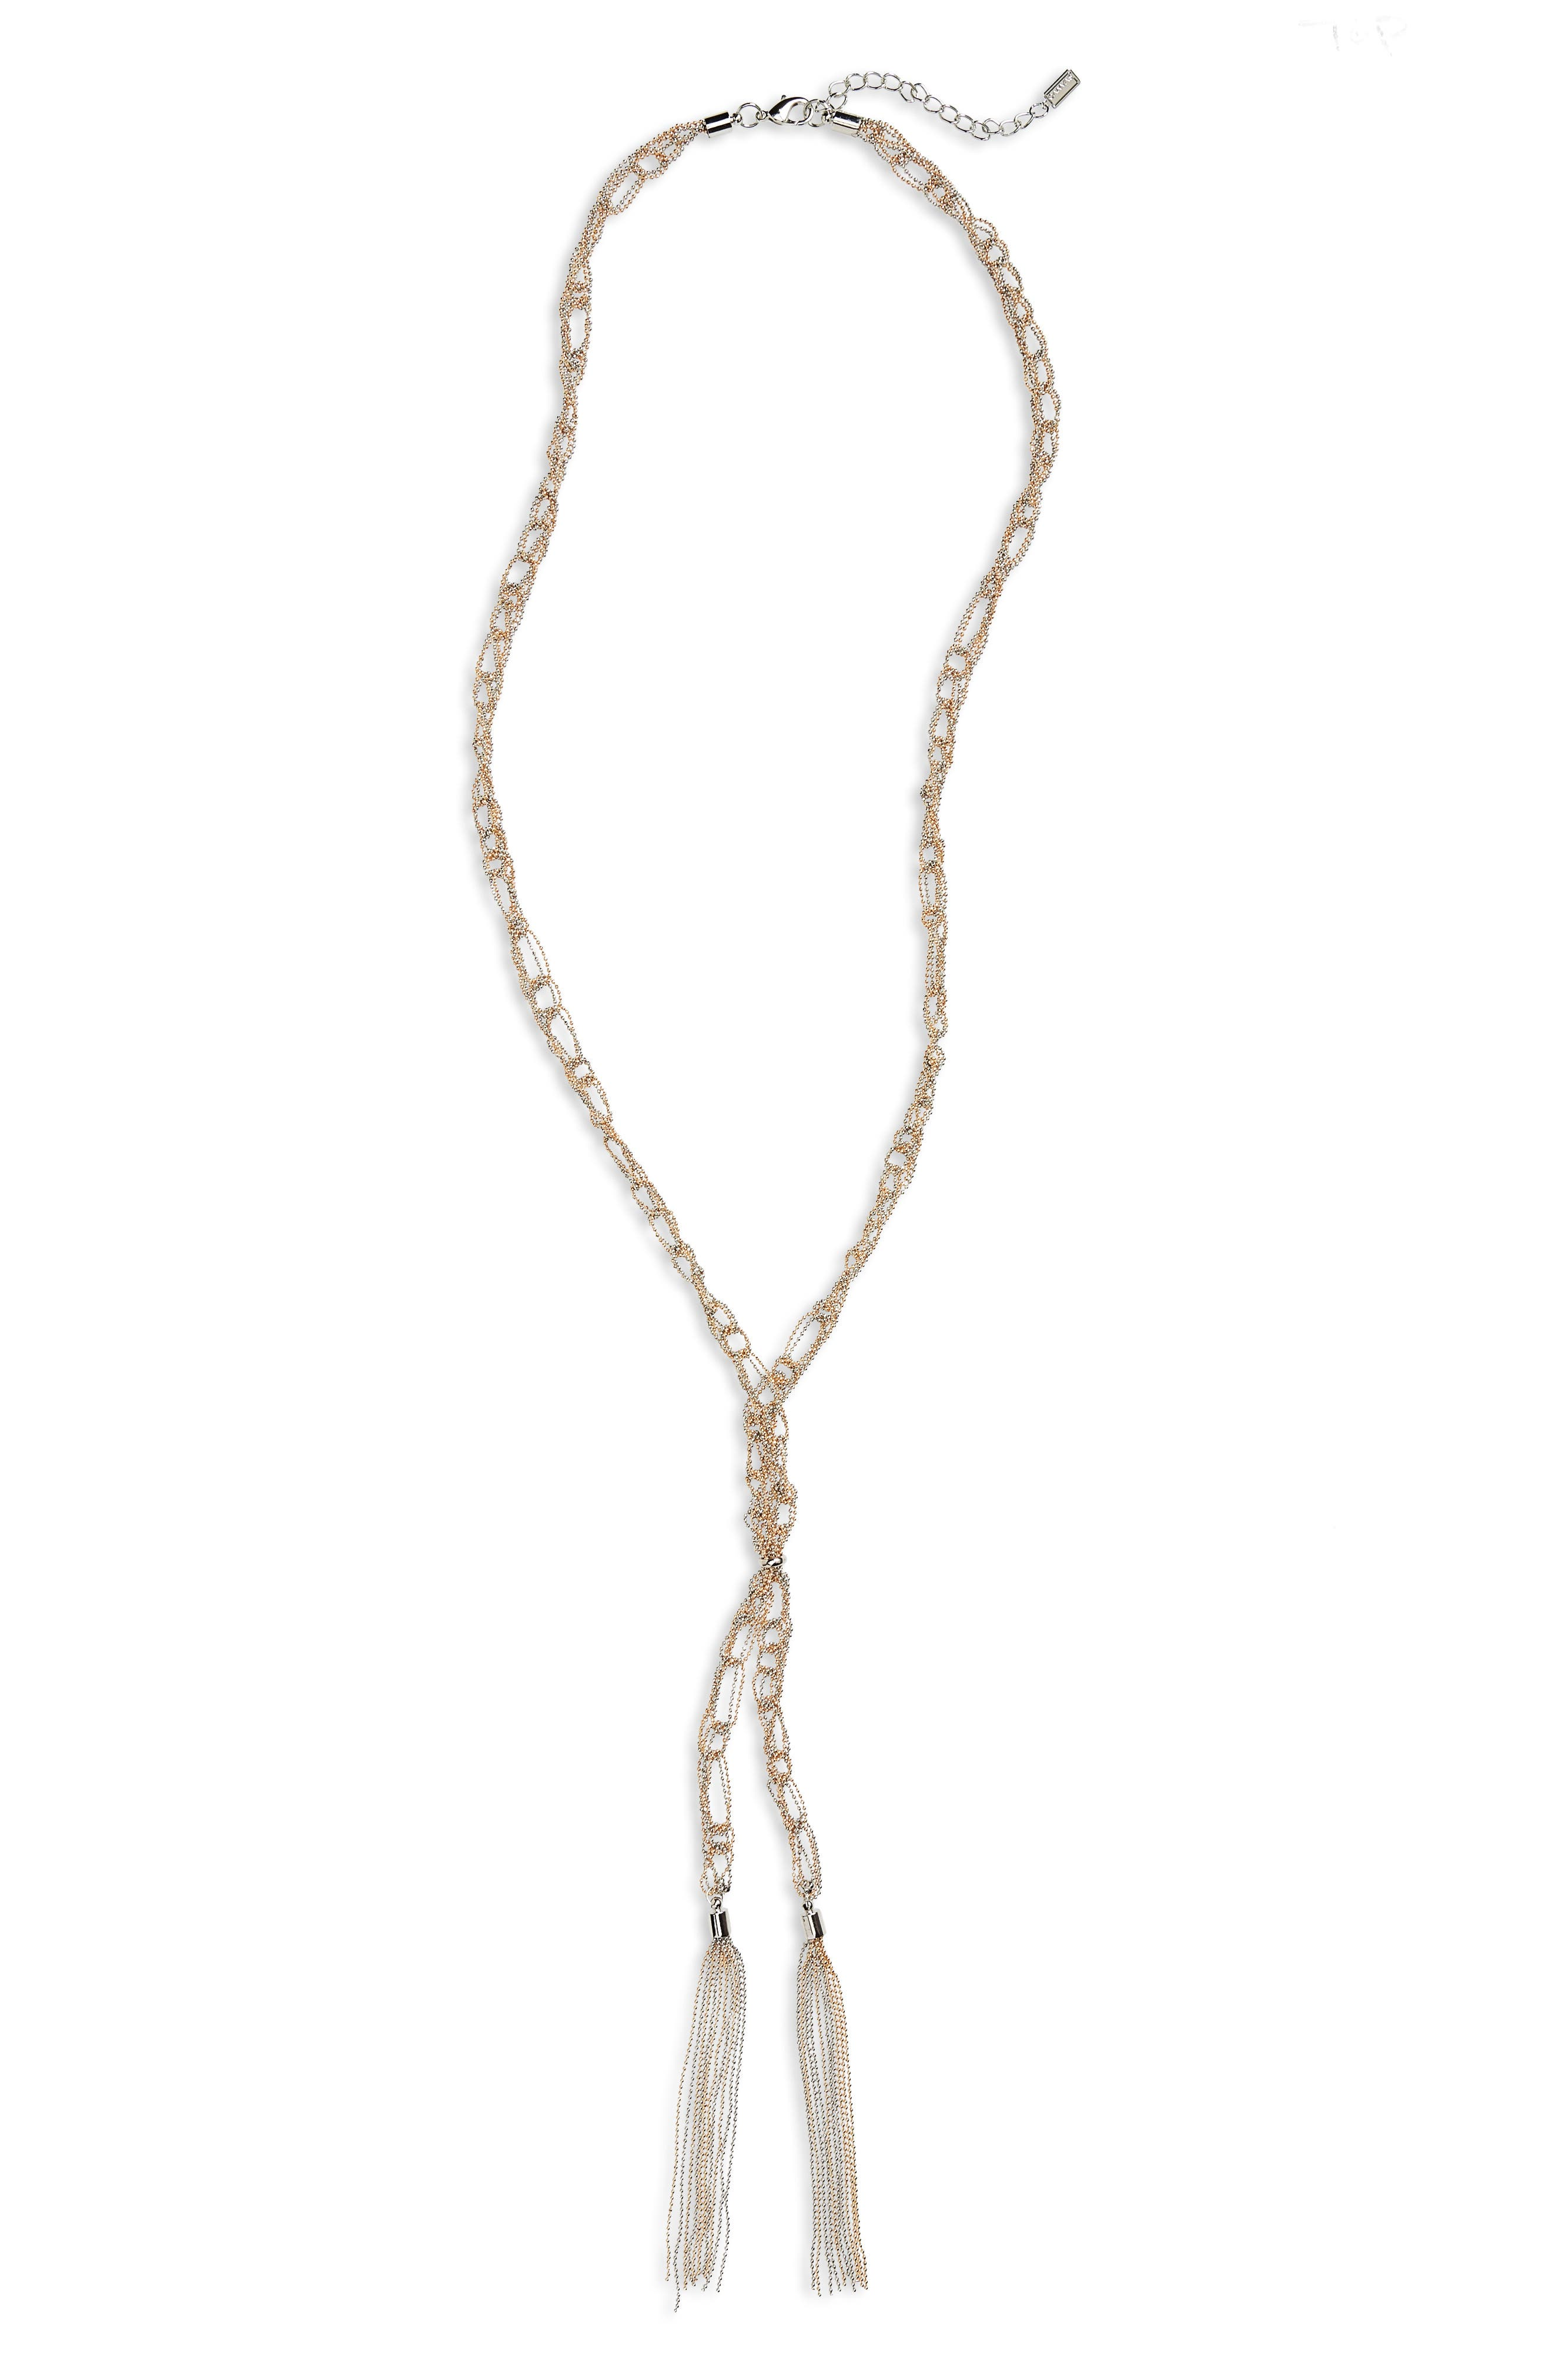 Ettika Tassel Layered Necklace in Metallic Gold TiQxB3